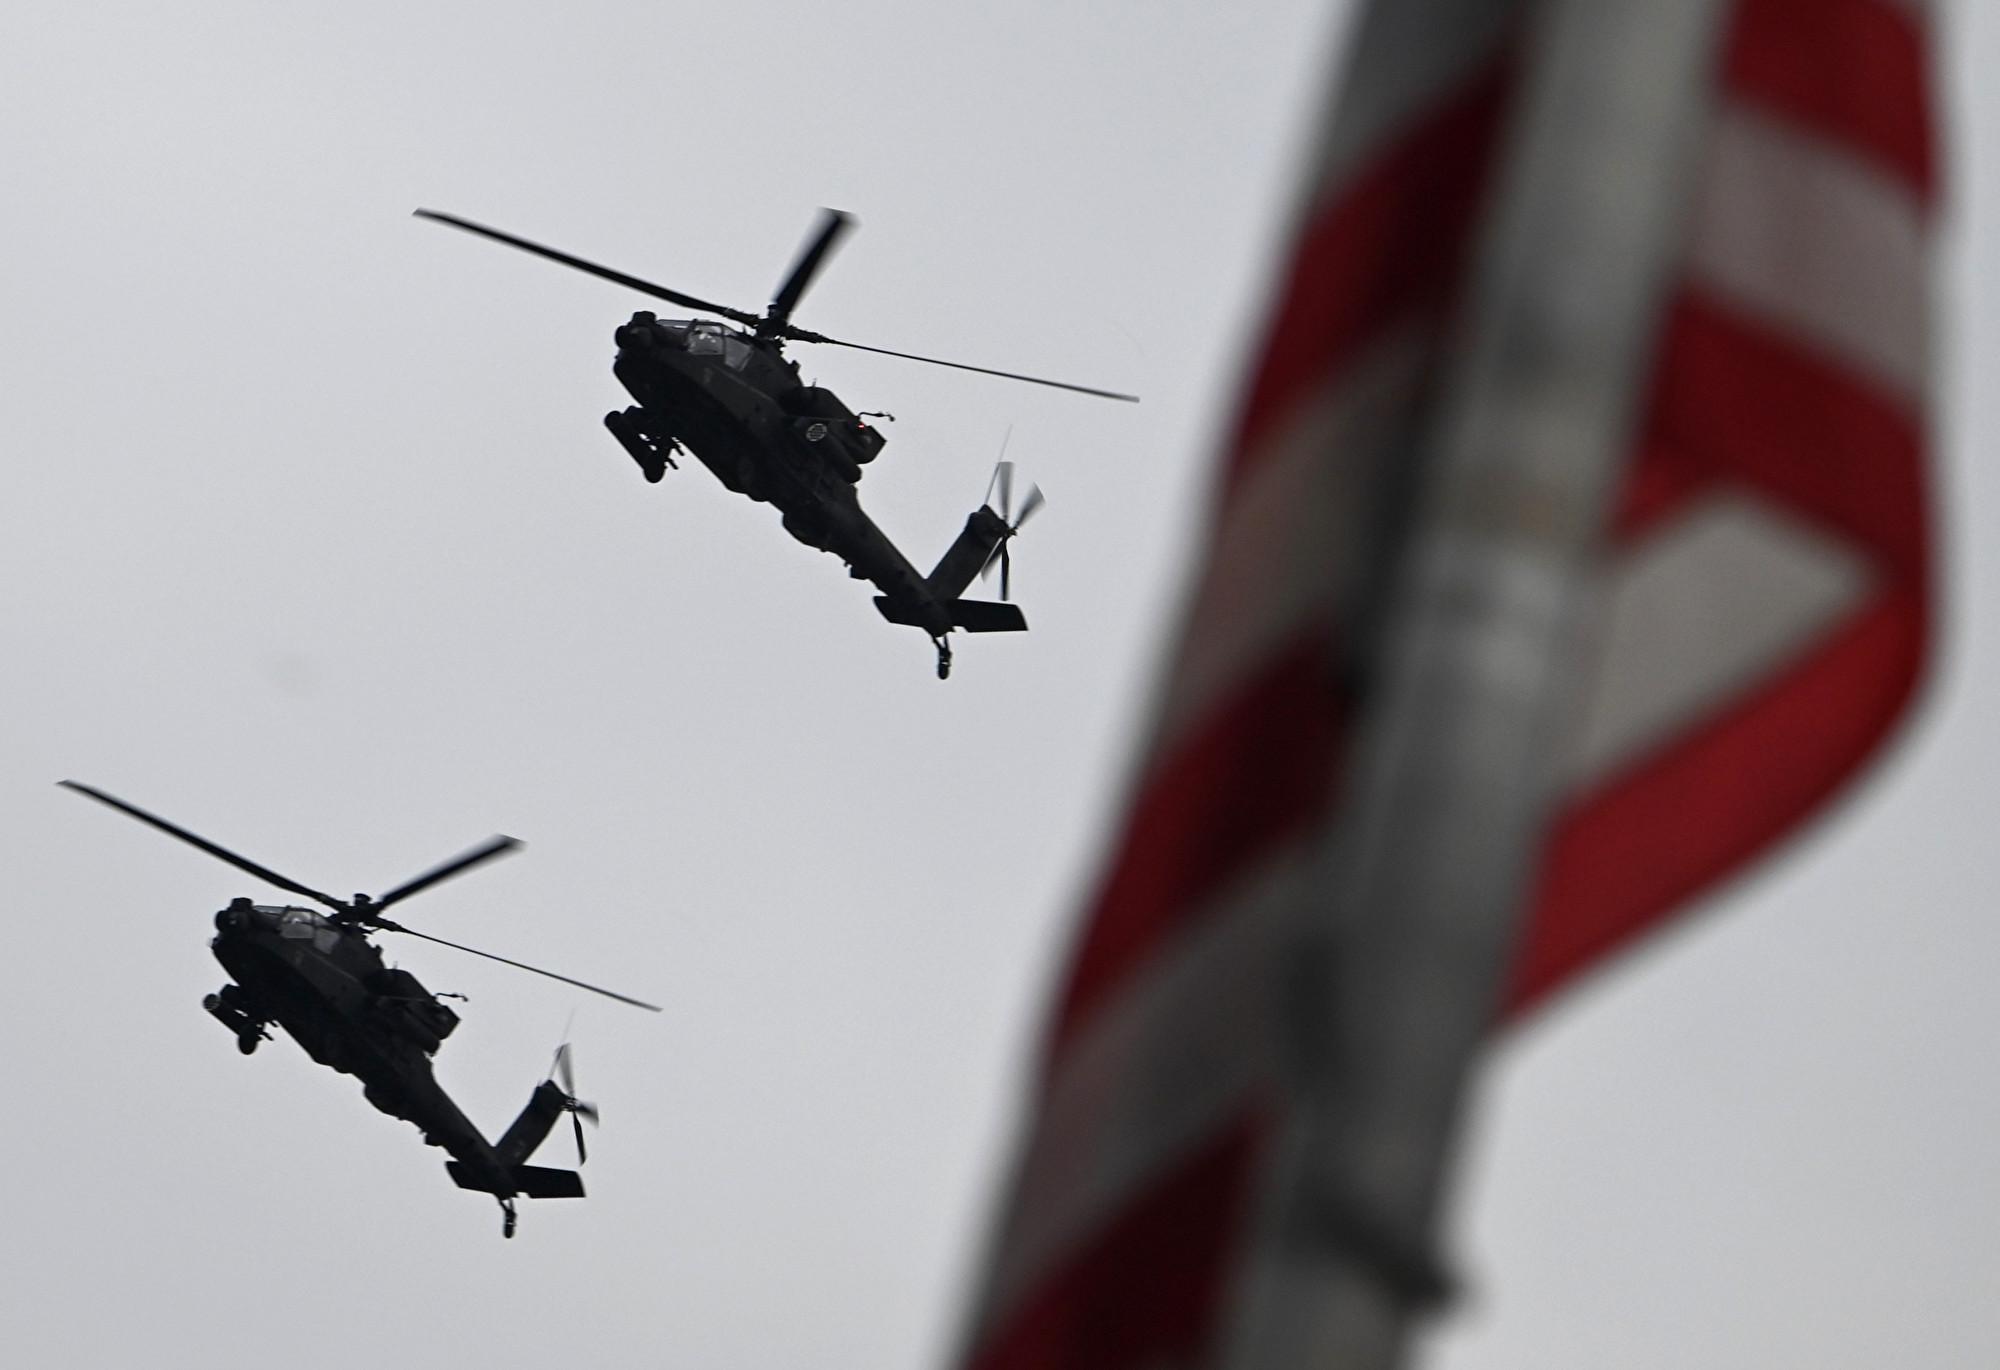 直升機飛過頭頂。(ANDREW CABALLERO-REYNOLDS/AFP)